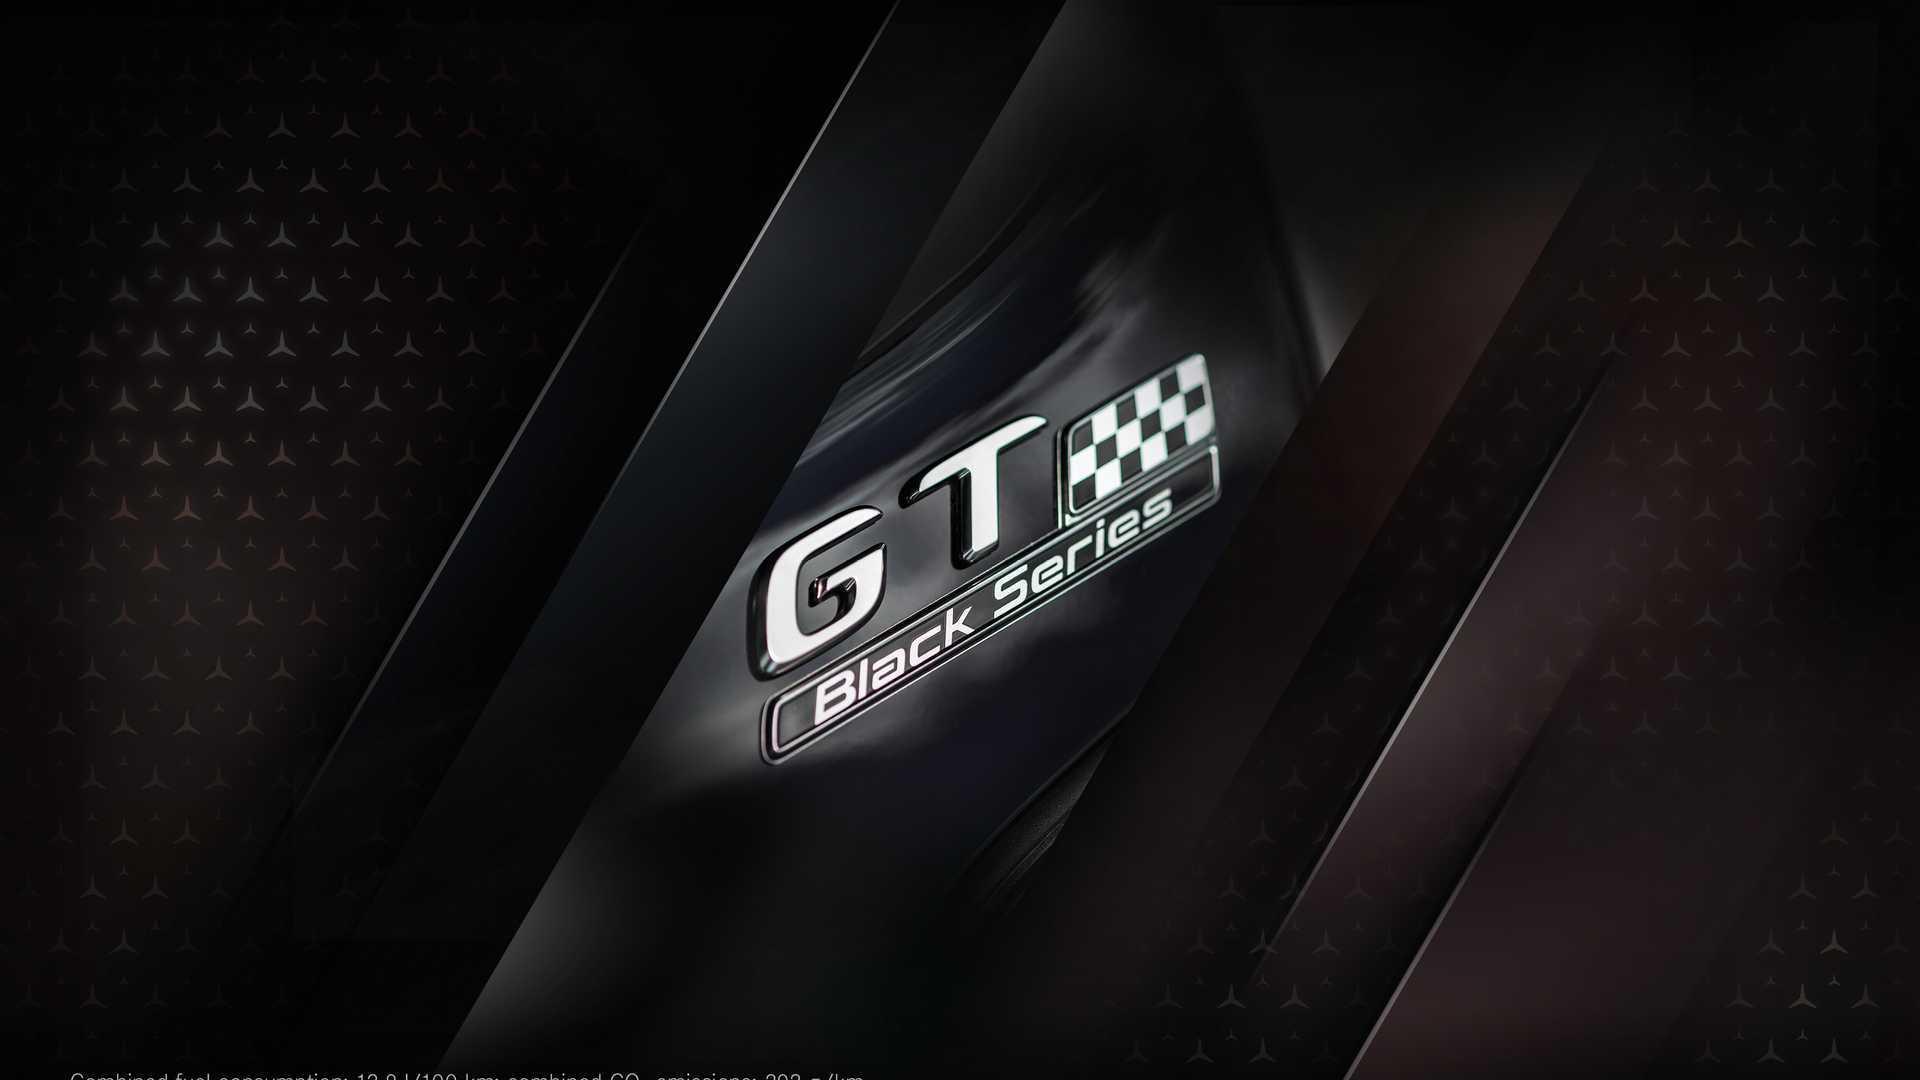 Mercedes-AMG GT Black Series Has 720 Horsepower: Official